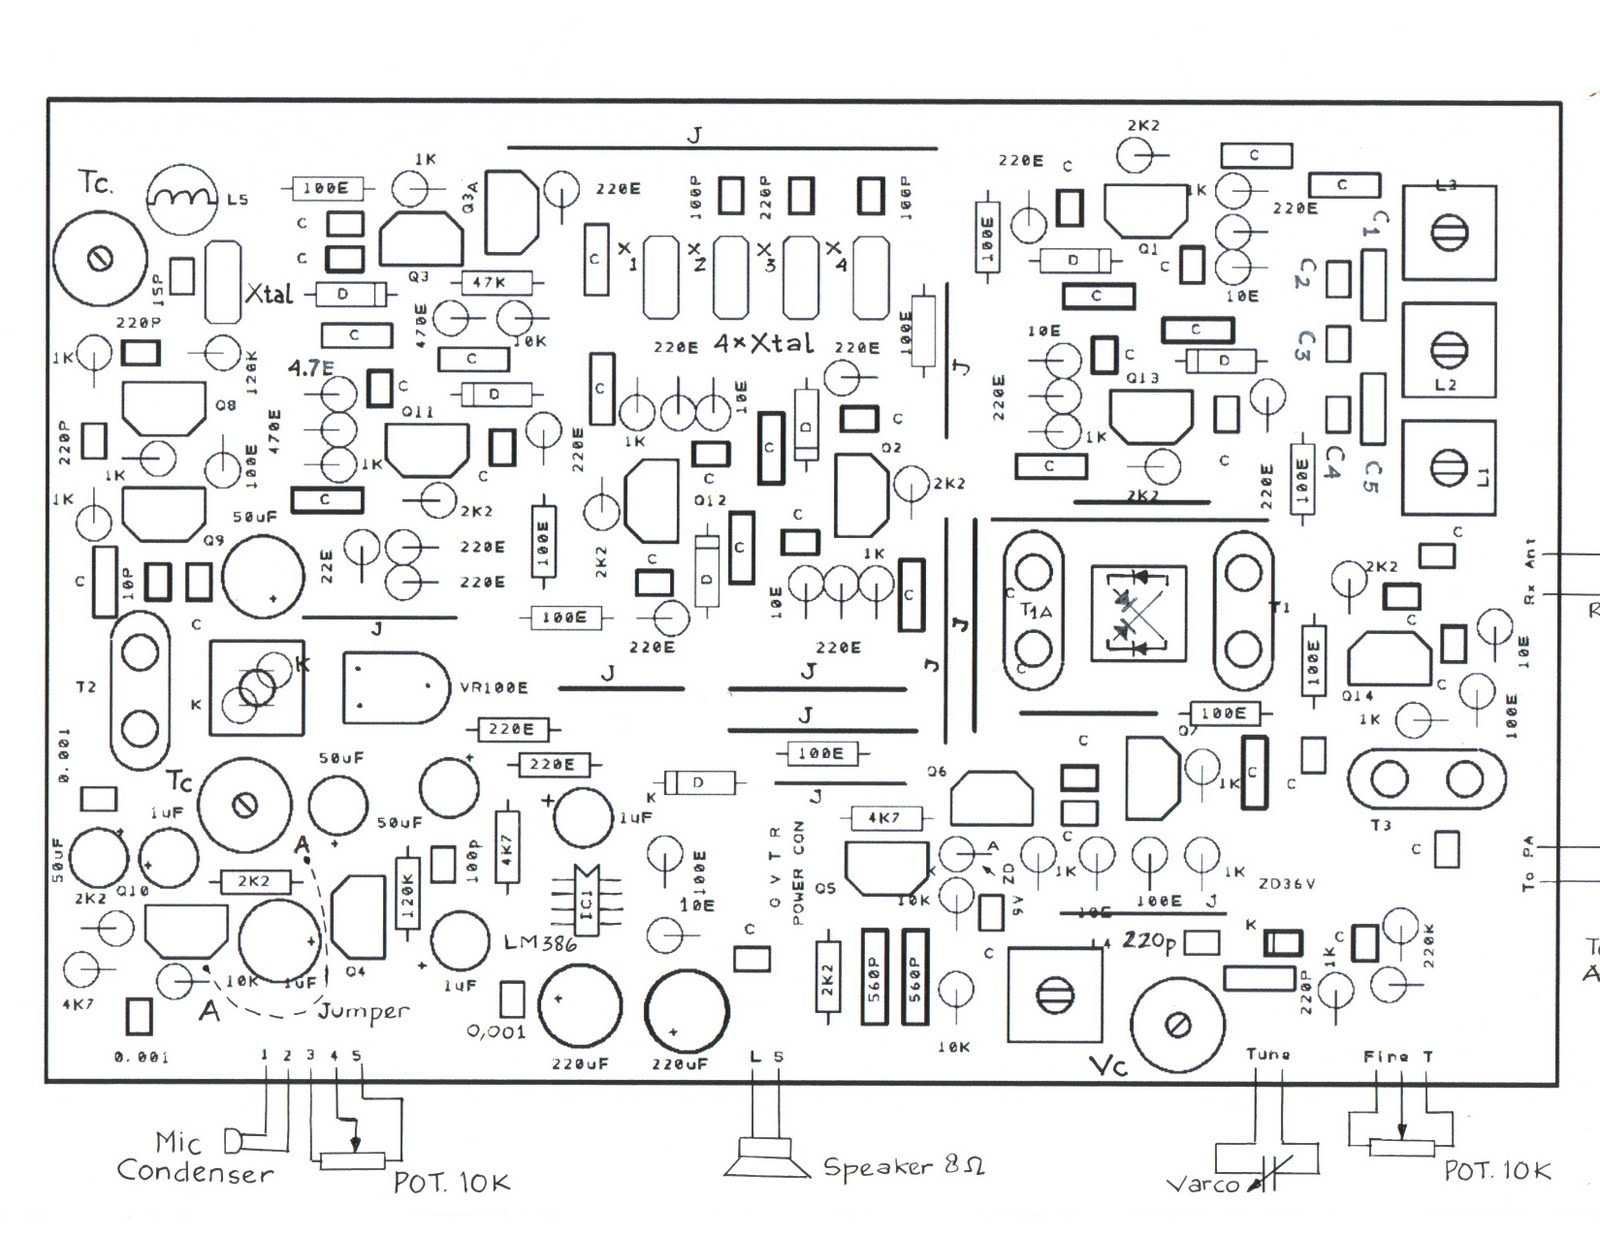 medium resolution of kenwood ez500 wiring harness wiring diagram specialtieskenwood kdc 610u wiring harnes wiring diagram databasea wiring harness